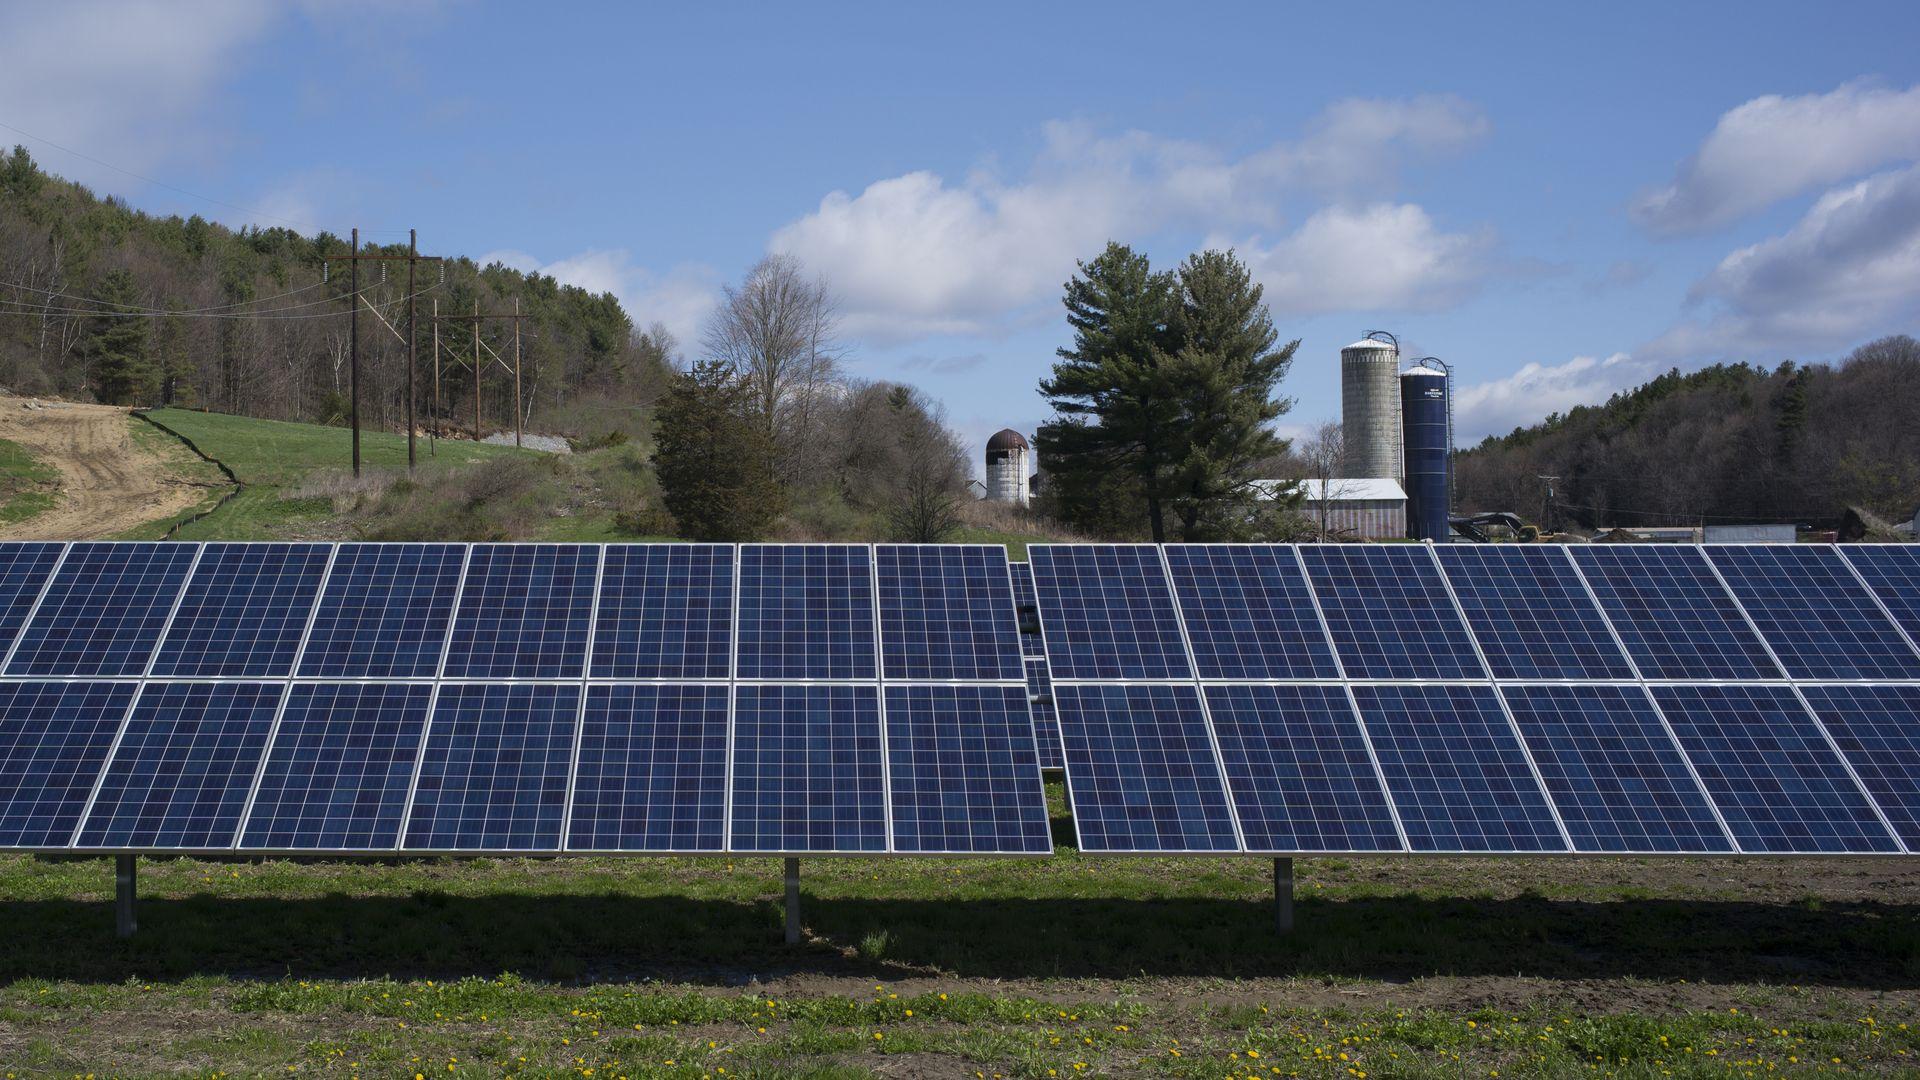 Solar panels near a dairy farm in Vermont.